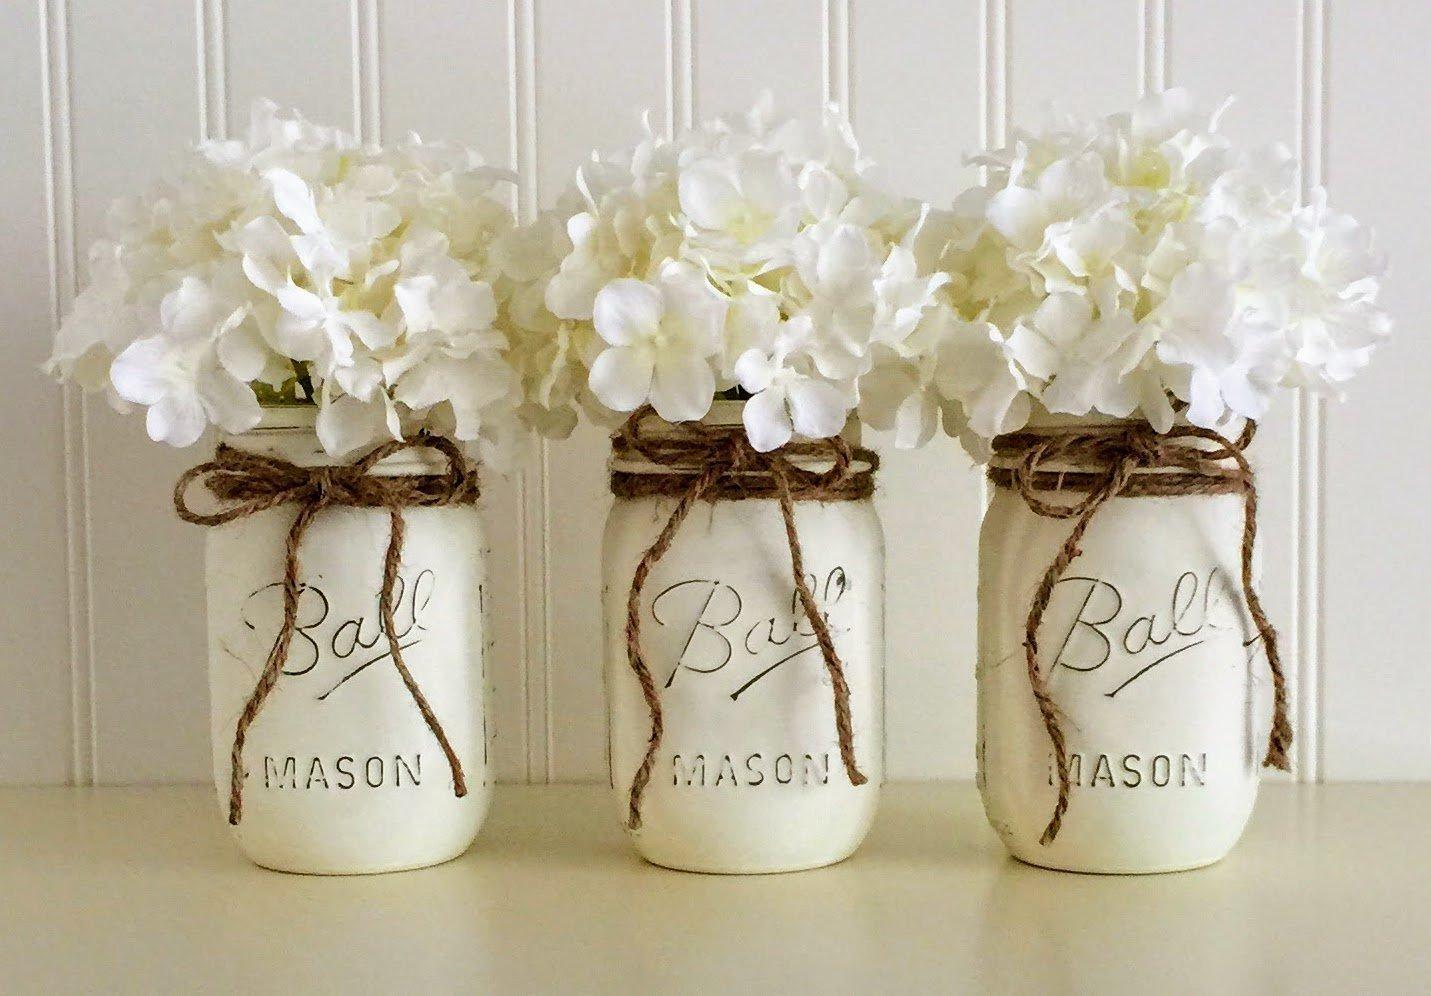 Amazon.com: Mason jar set - 3 Piece, White, Wedding Centerpiece ...